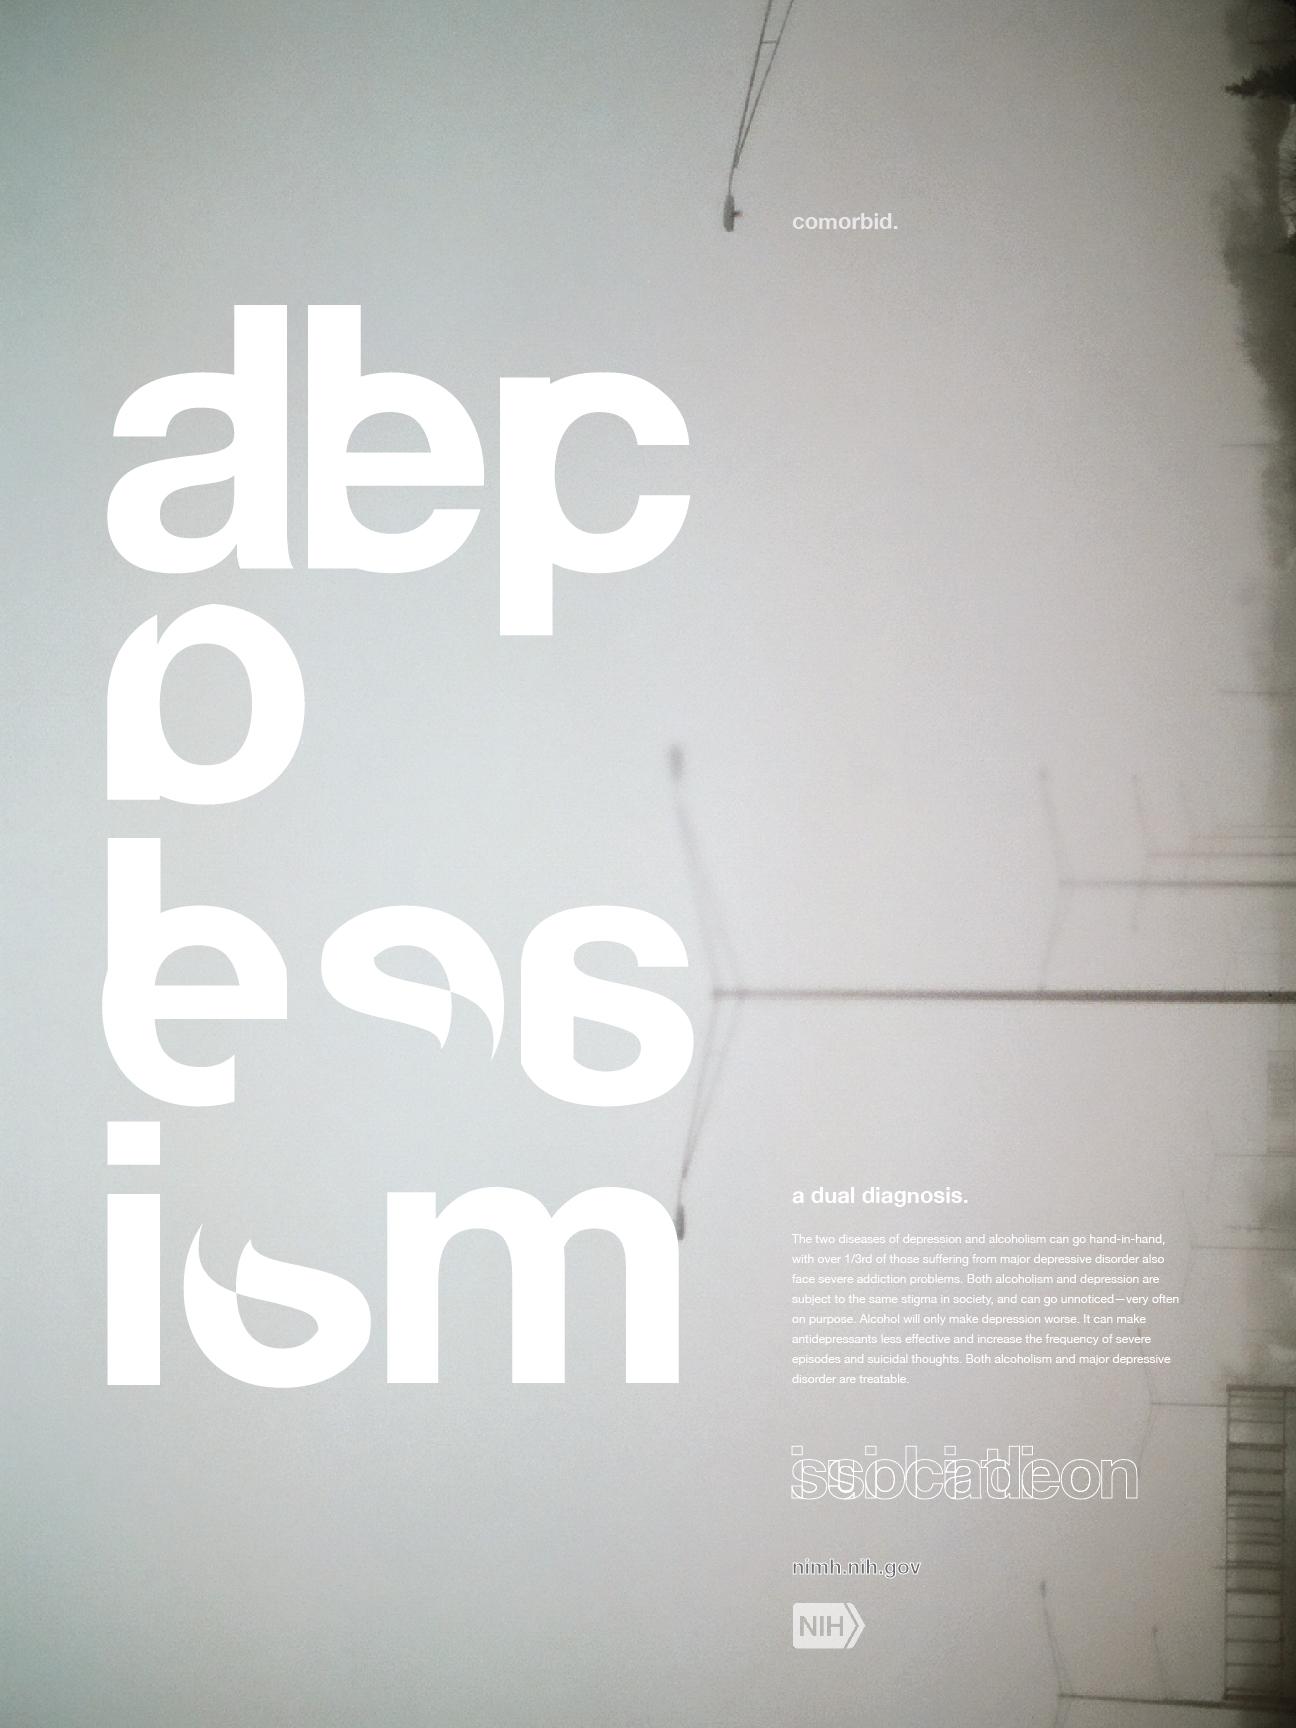 aldep_-01.jpg